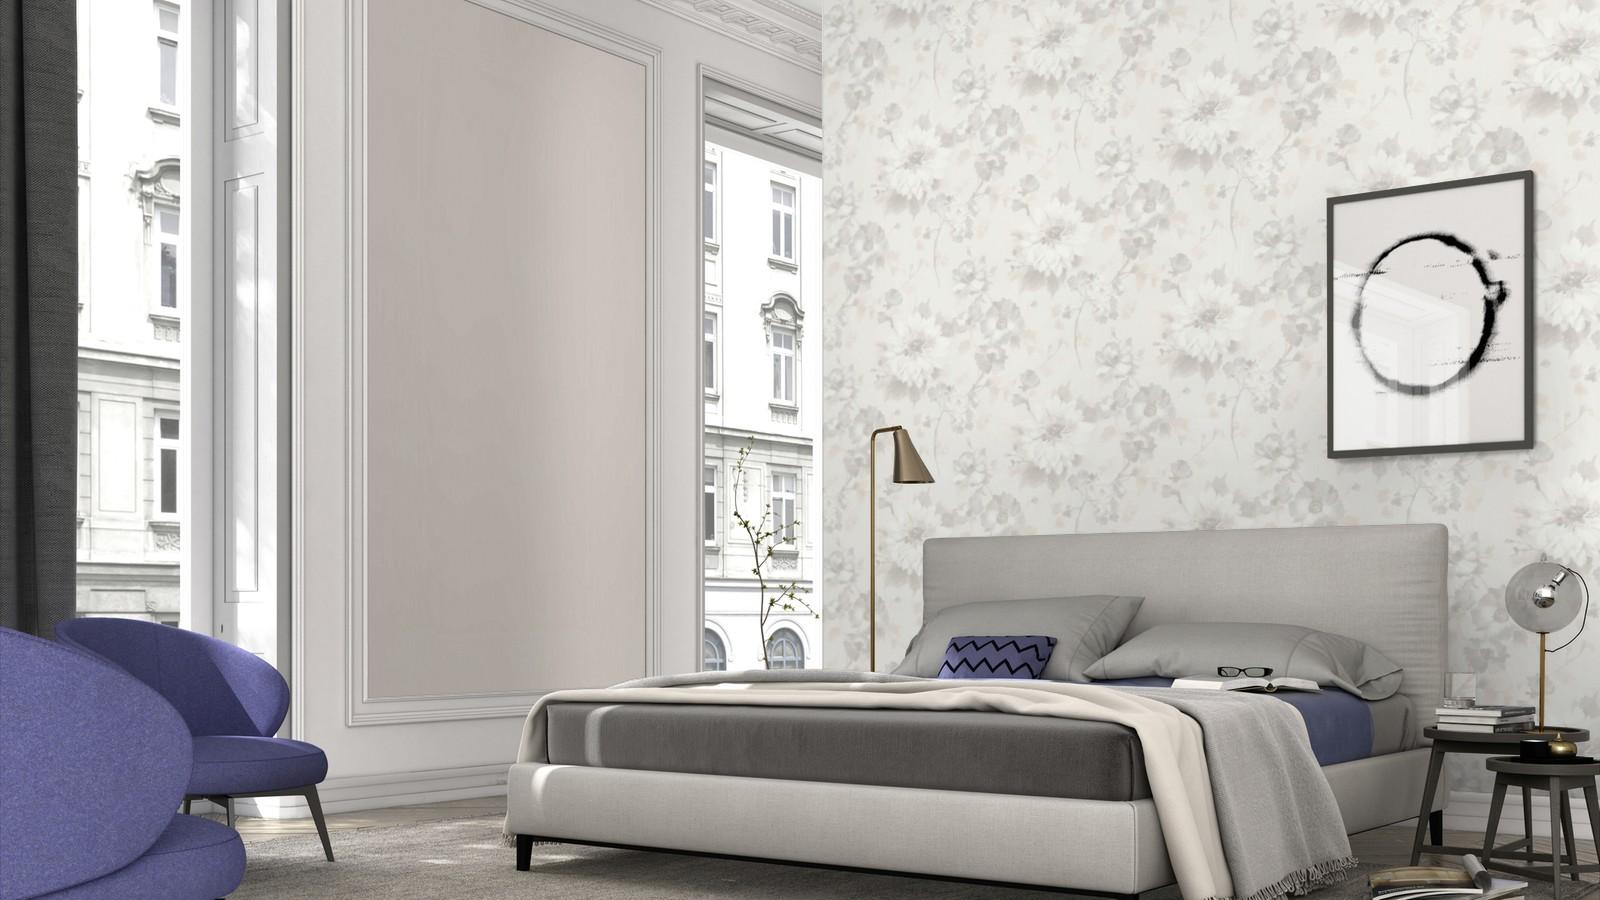 Обои Erismann GMK Fashion for Walls New 10004-14 (Эрисман)